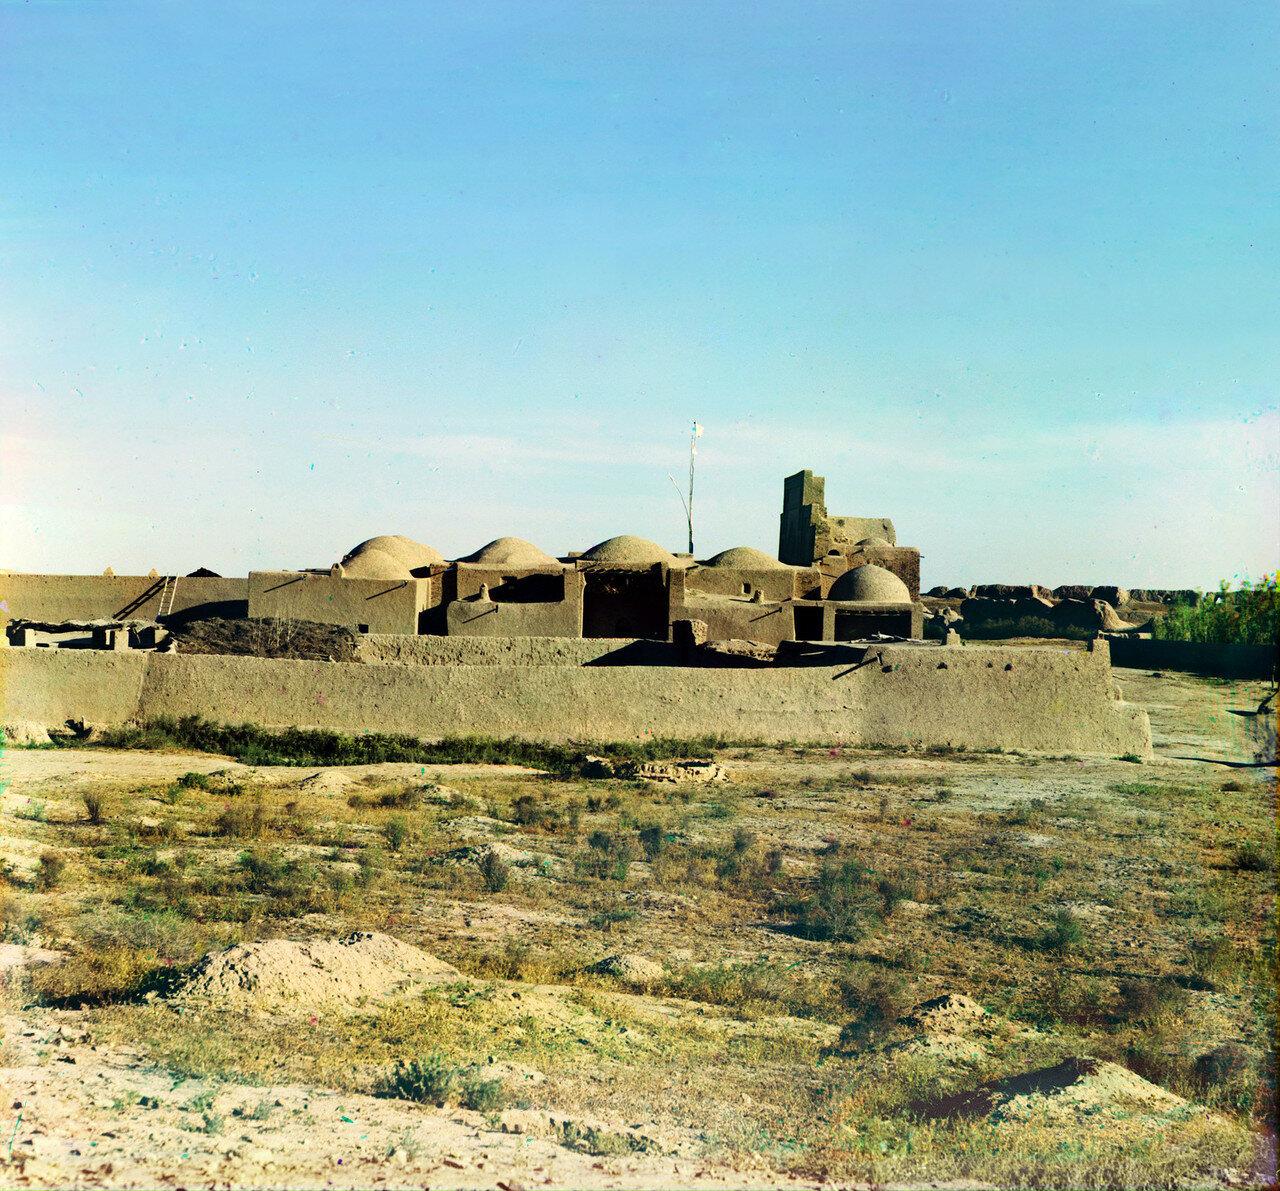 Древний Мерв. Мечеть-мавзолей Юсуфа Хамаданского